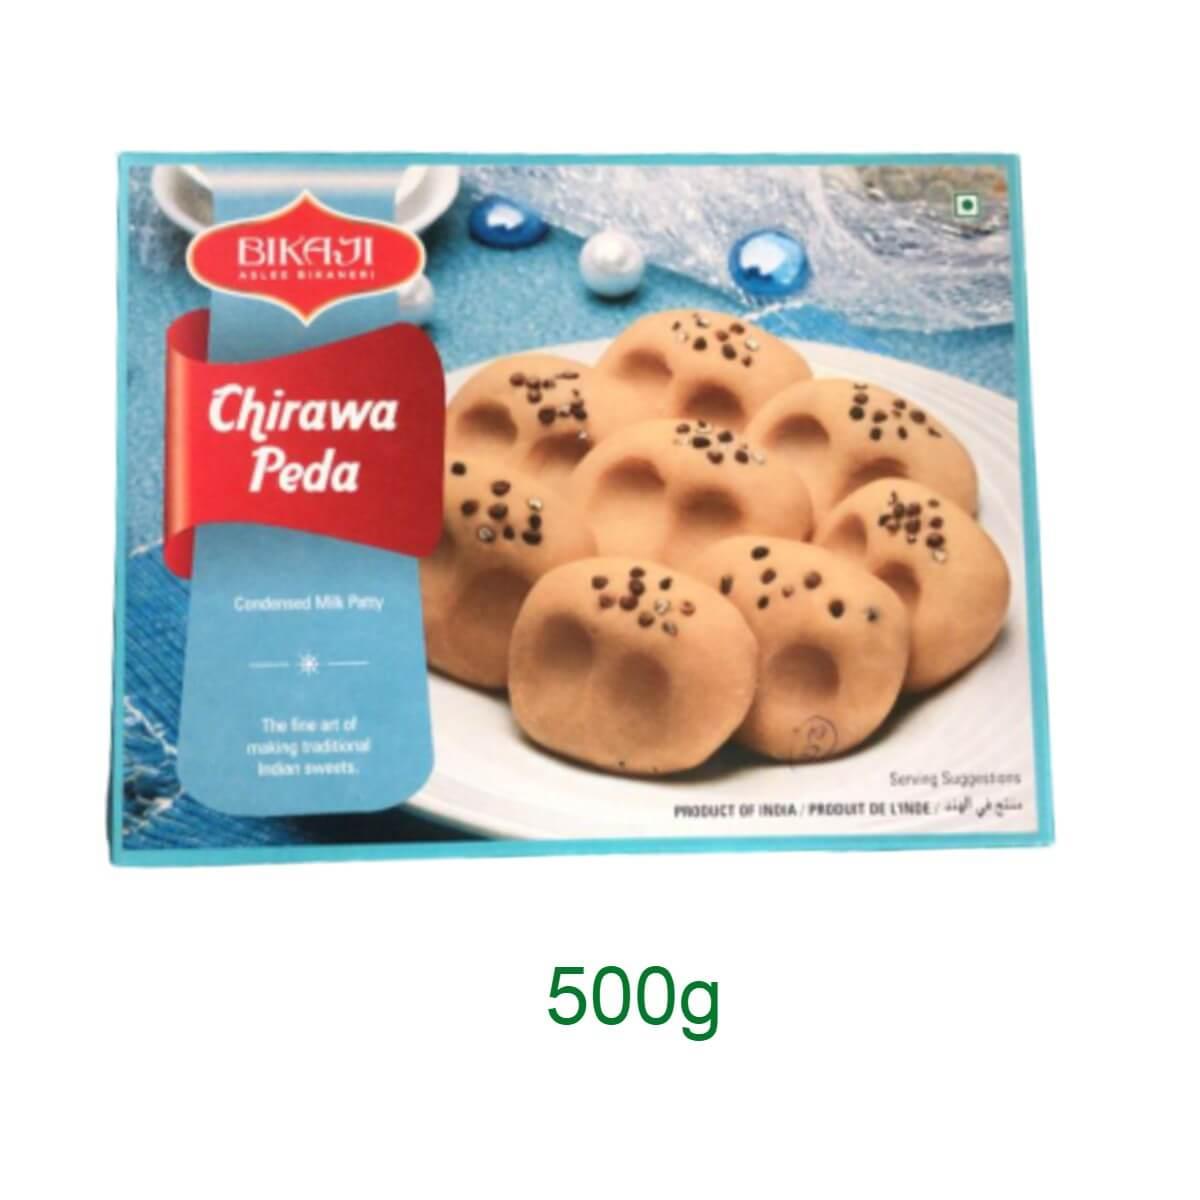 Bikaji Chirawa Peda 500 gm